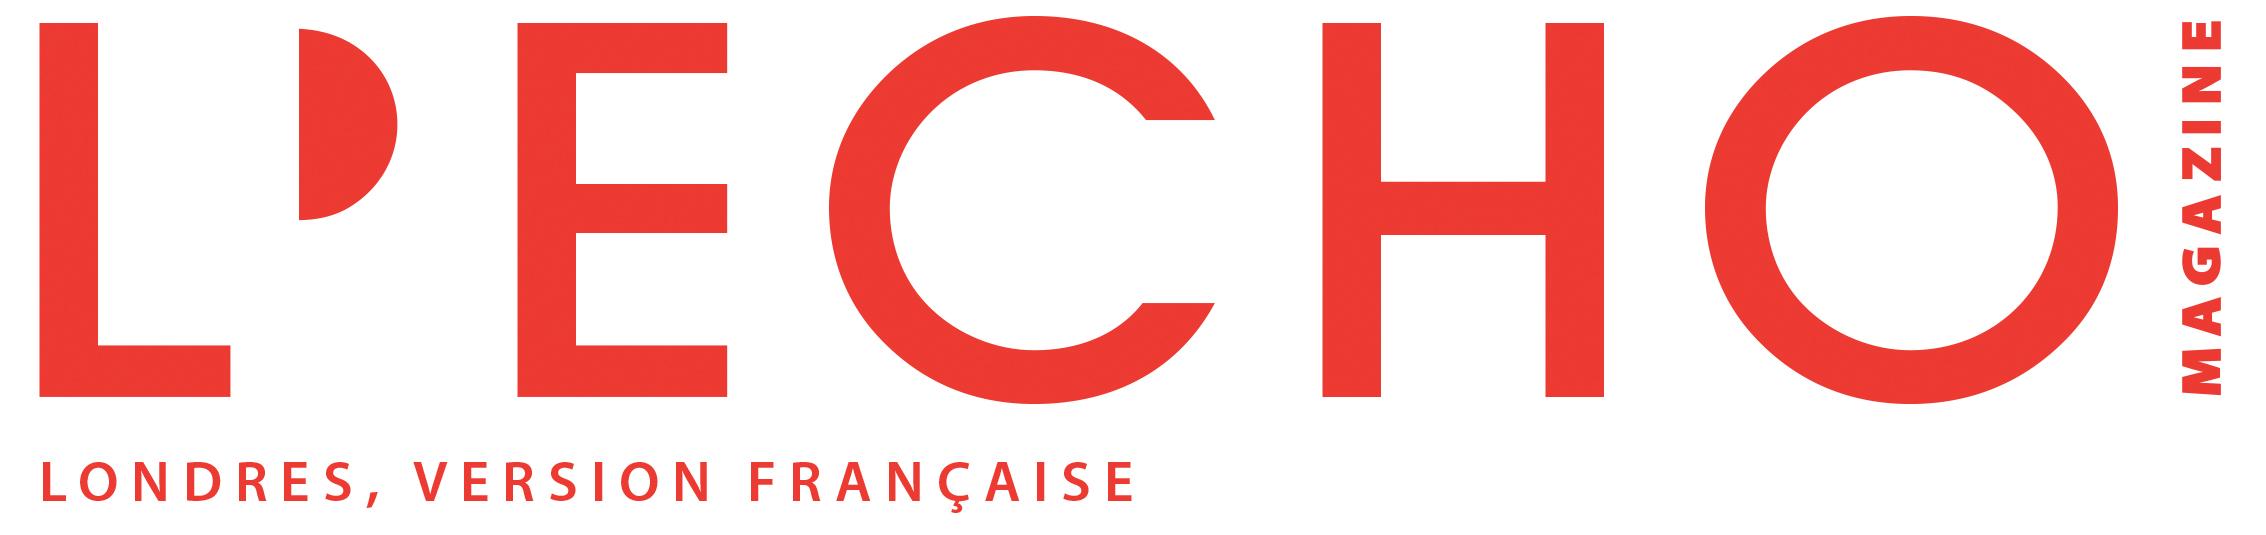 L'ECHO Magazine français de Londres